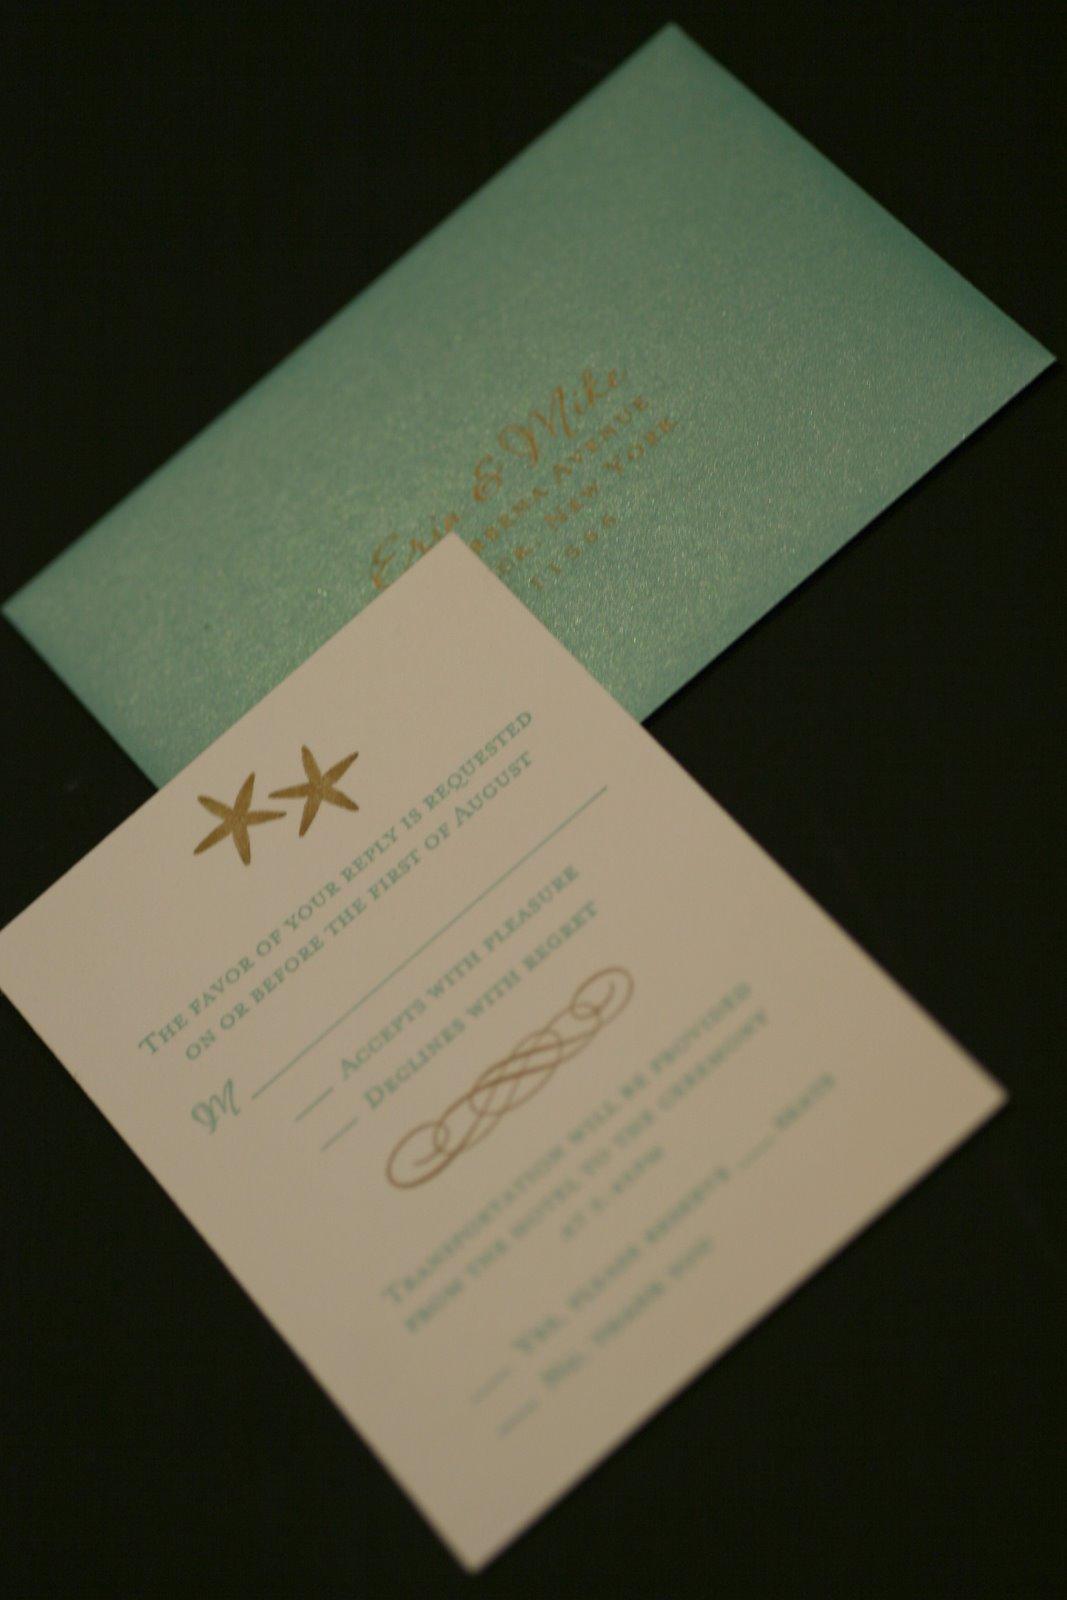 Wedding Gifts For Parents Remarriage : The AtelierJoie Studios Design & Letterpress Blog: September 2010